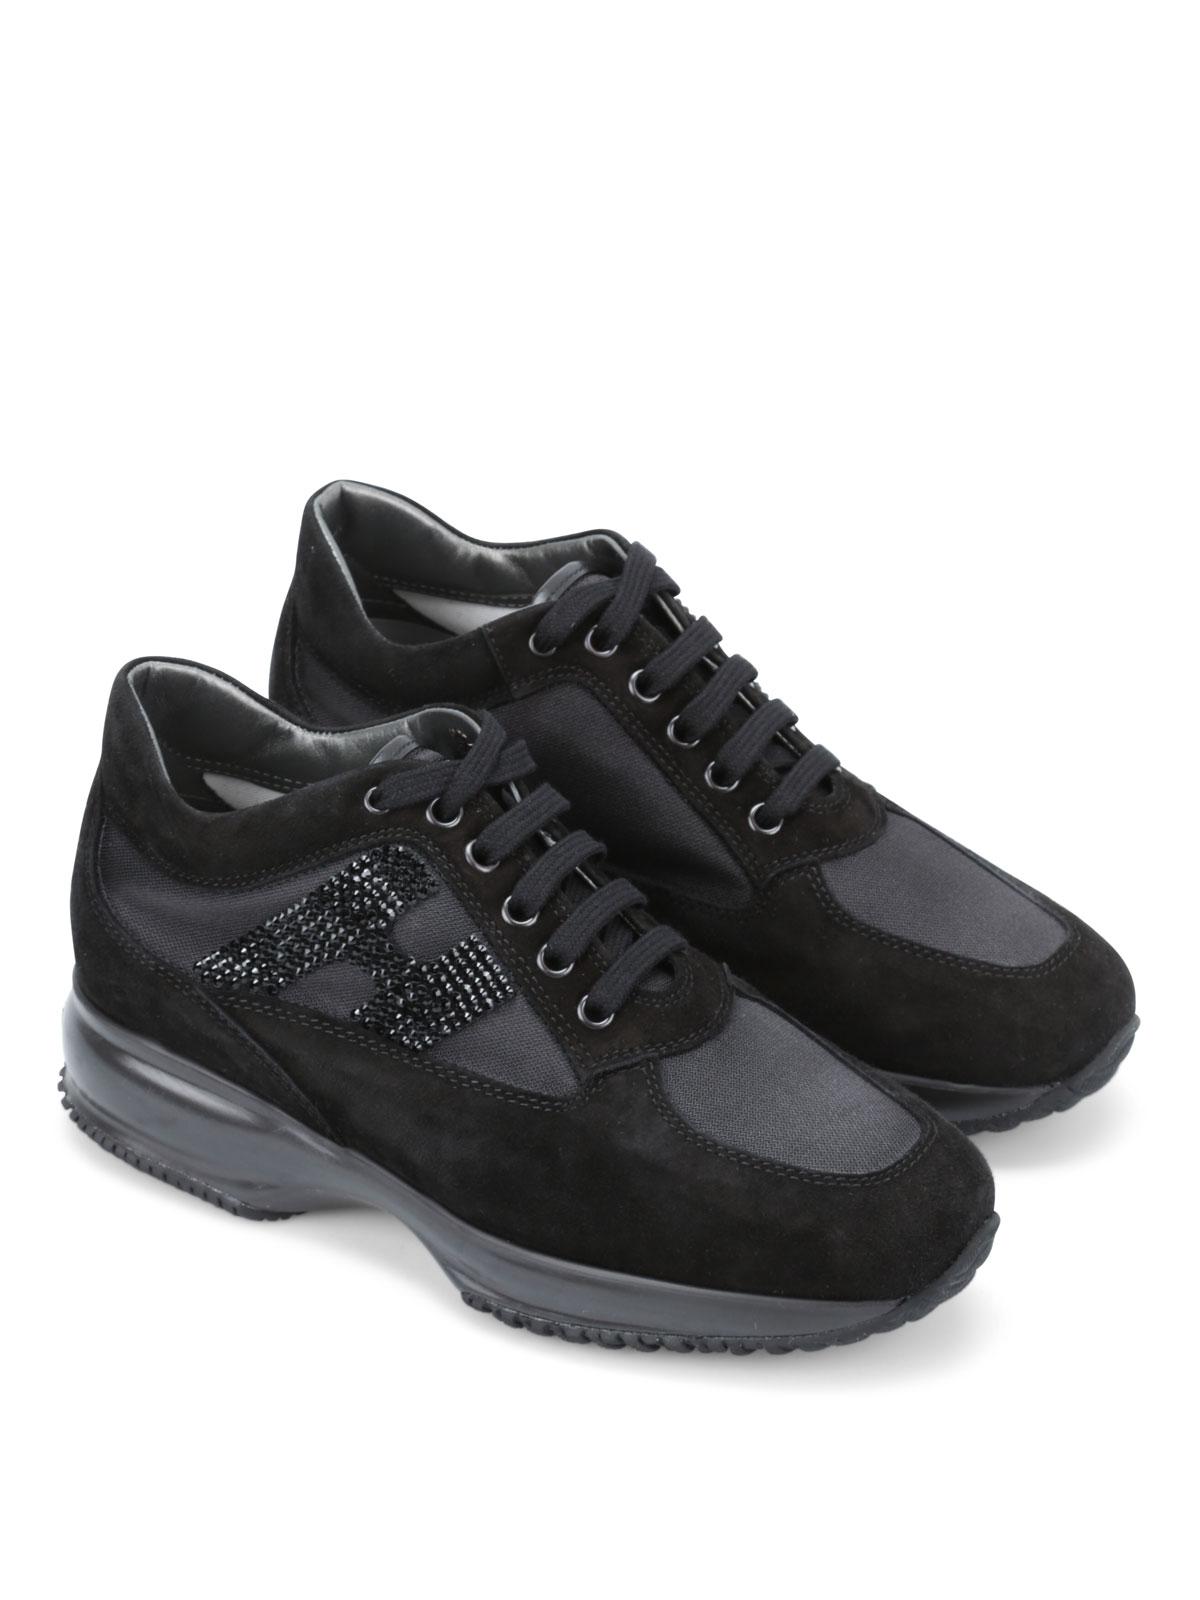 Sneakers Hogan - Interactive H strass - HXW00N02011SG29986   iKRIX.com